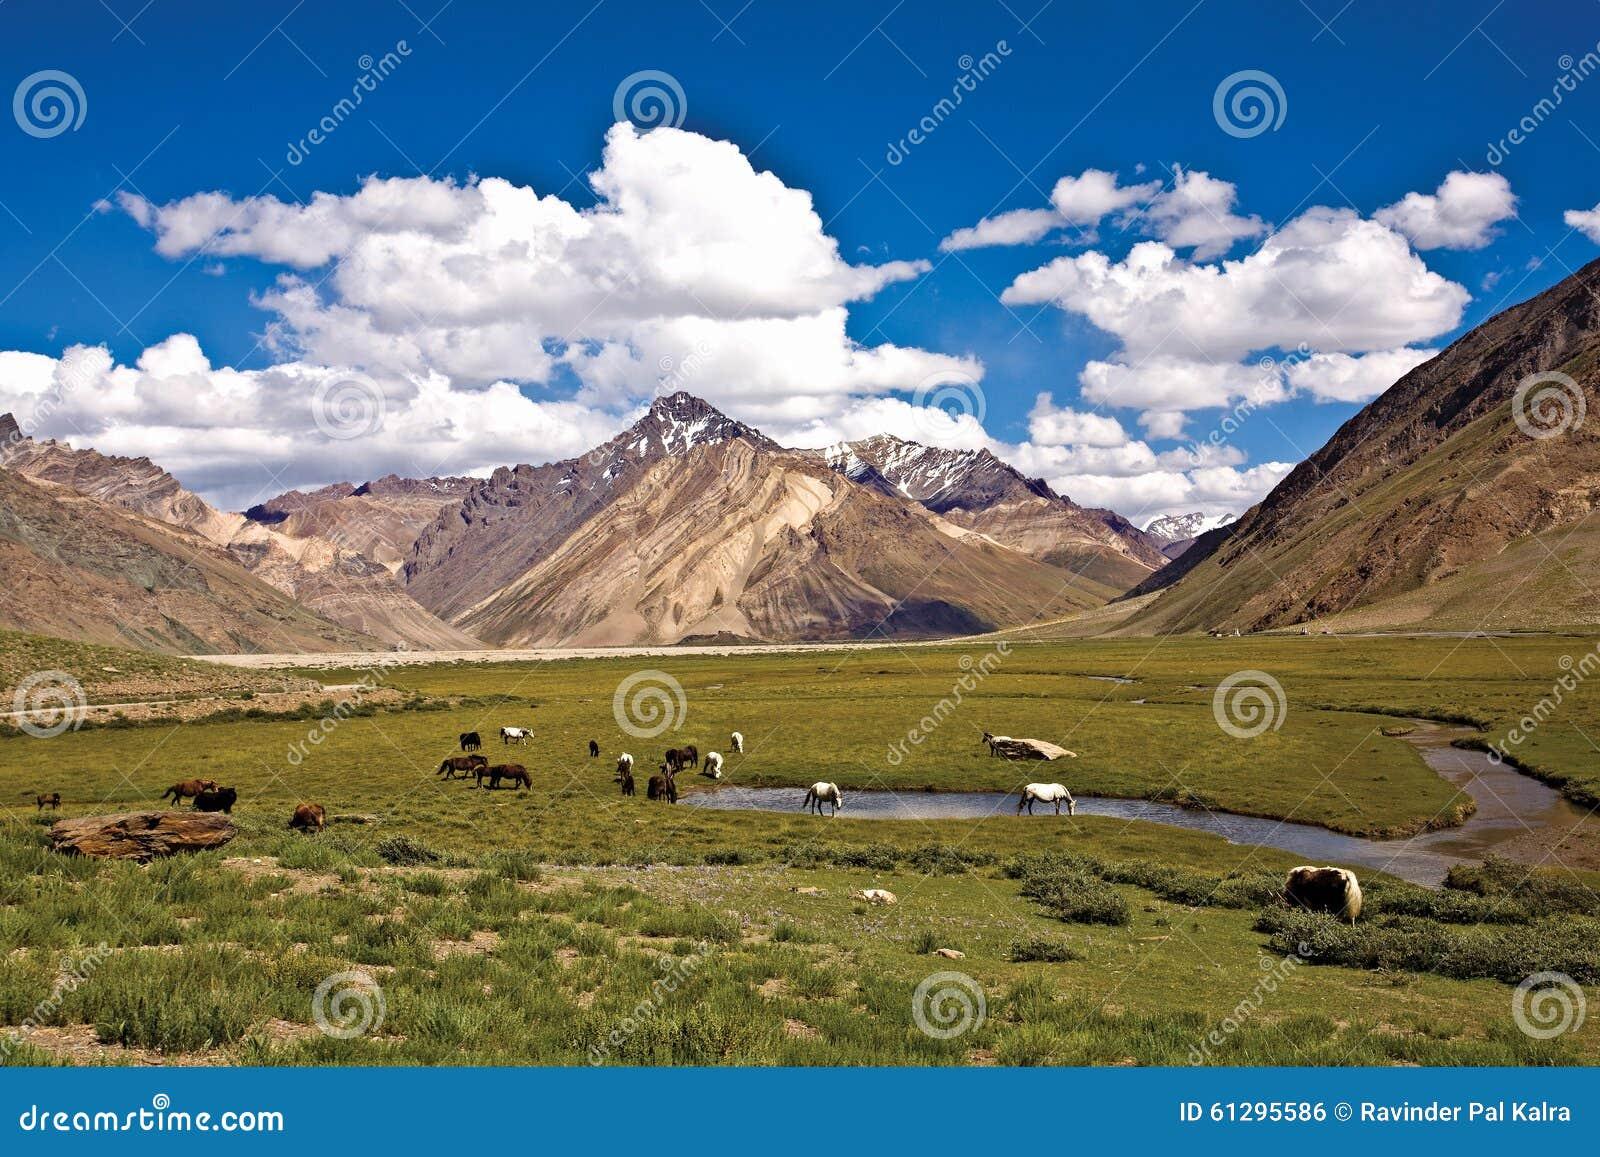 Un paisaje cerca del monasterio de Rangdum, valle de Zanskar, Ladakh, Jammu y Cachemira, la India